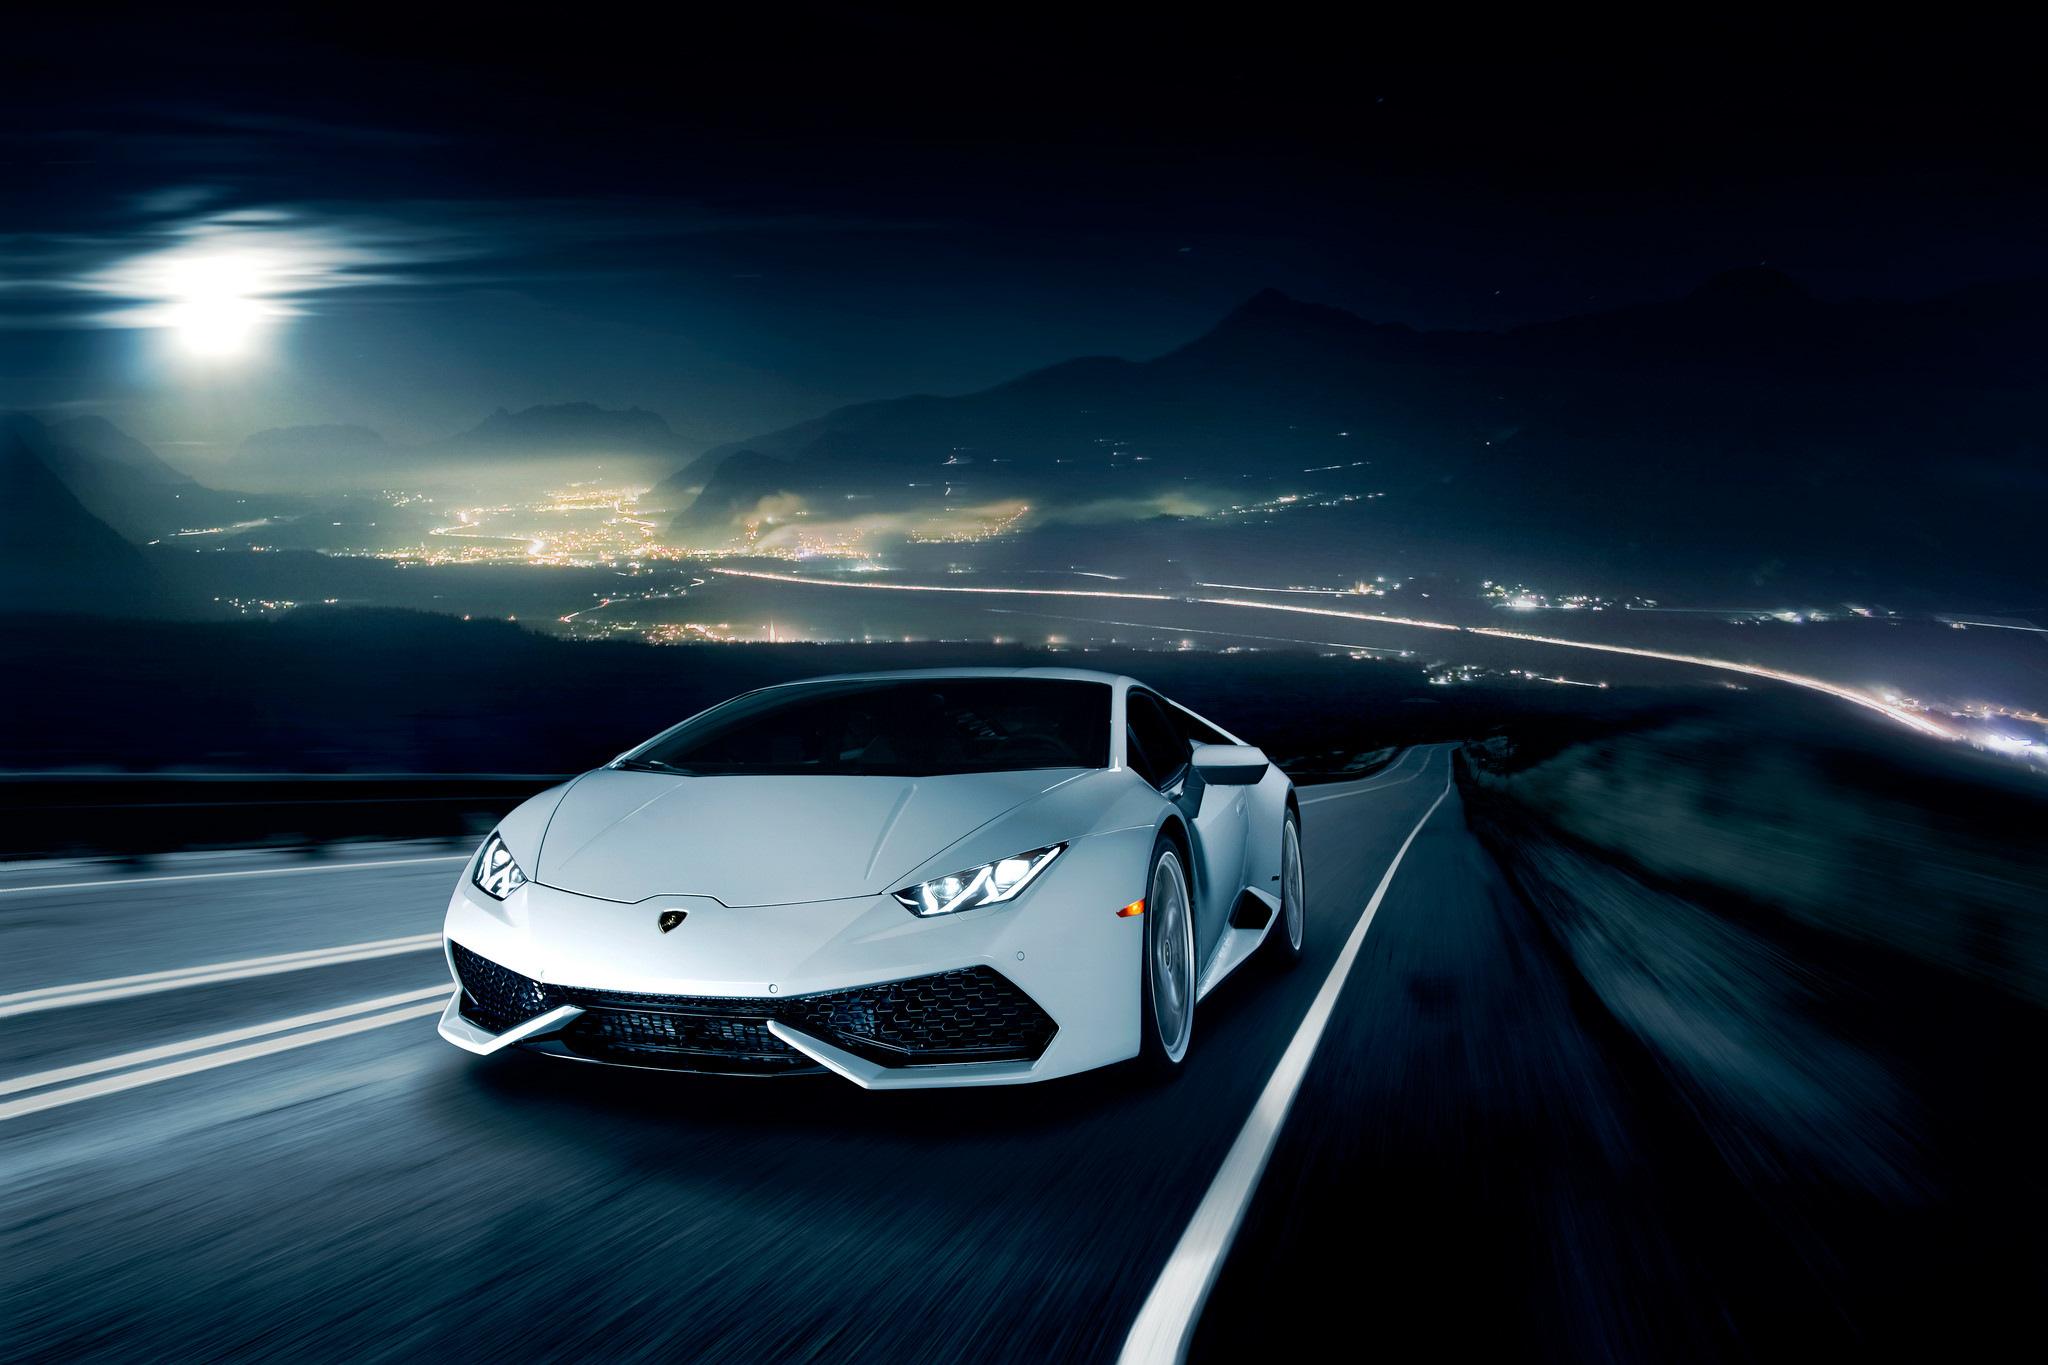 Lamborghini Huracan Fonds D 233 Cran Arri 232 Res Plan 2048x1365 Id 571631